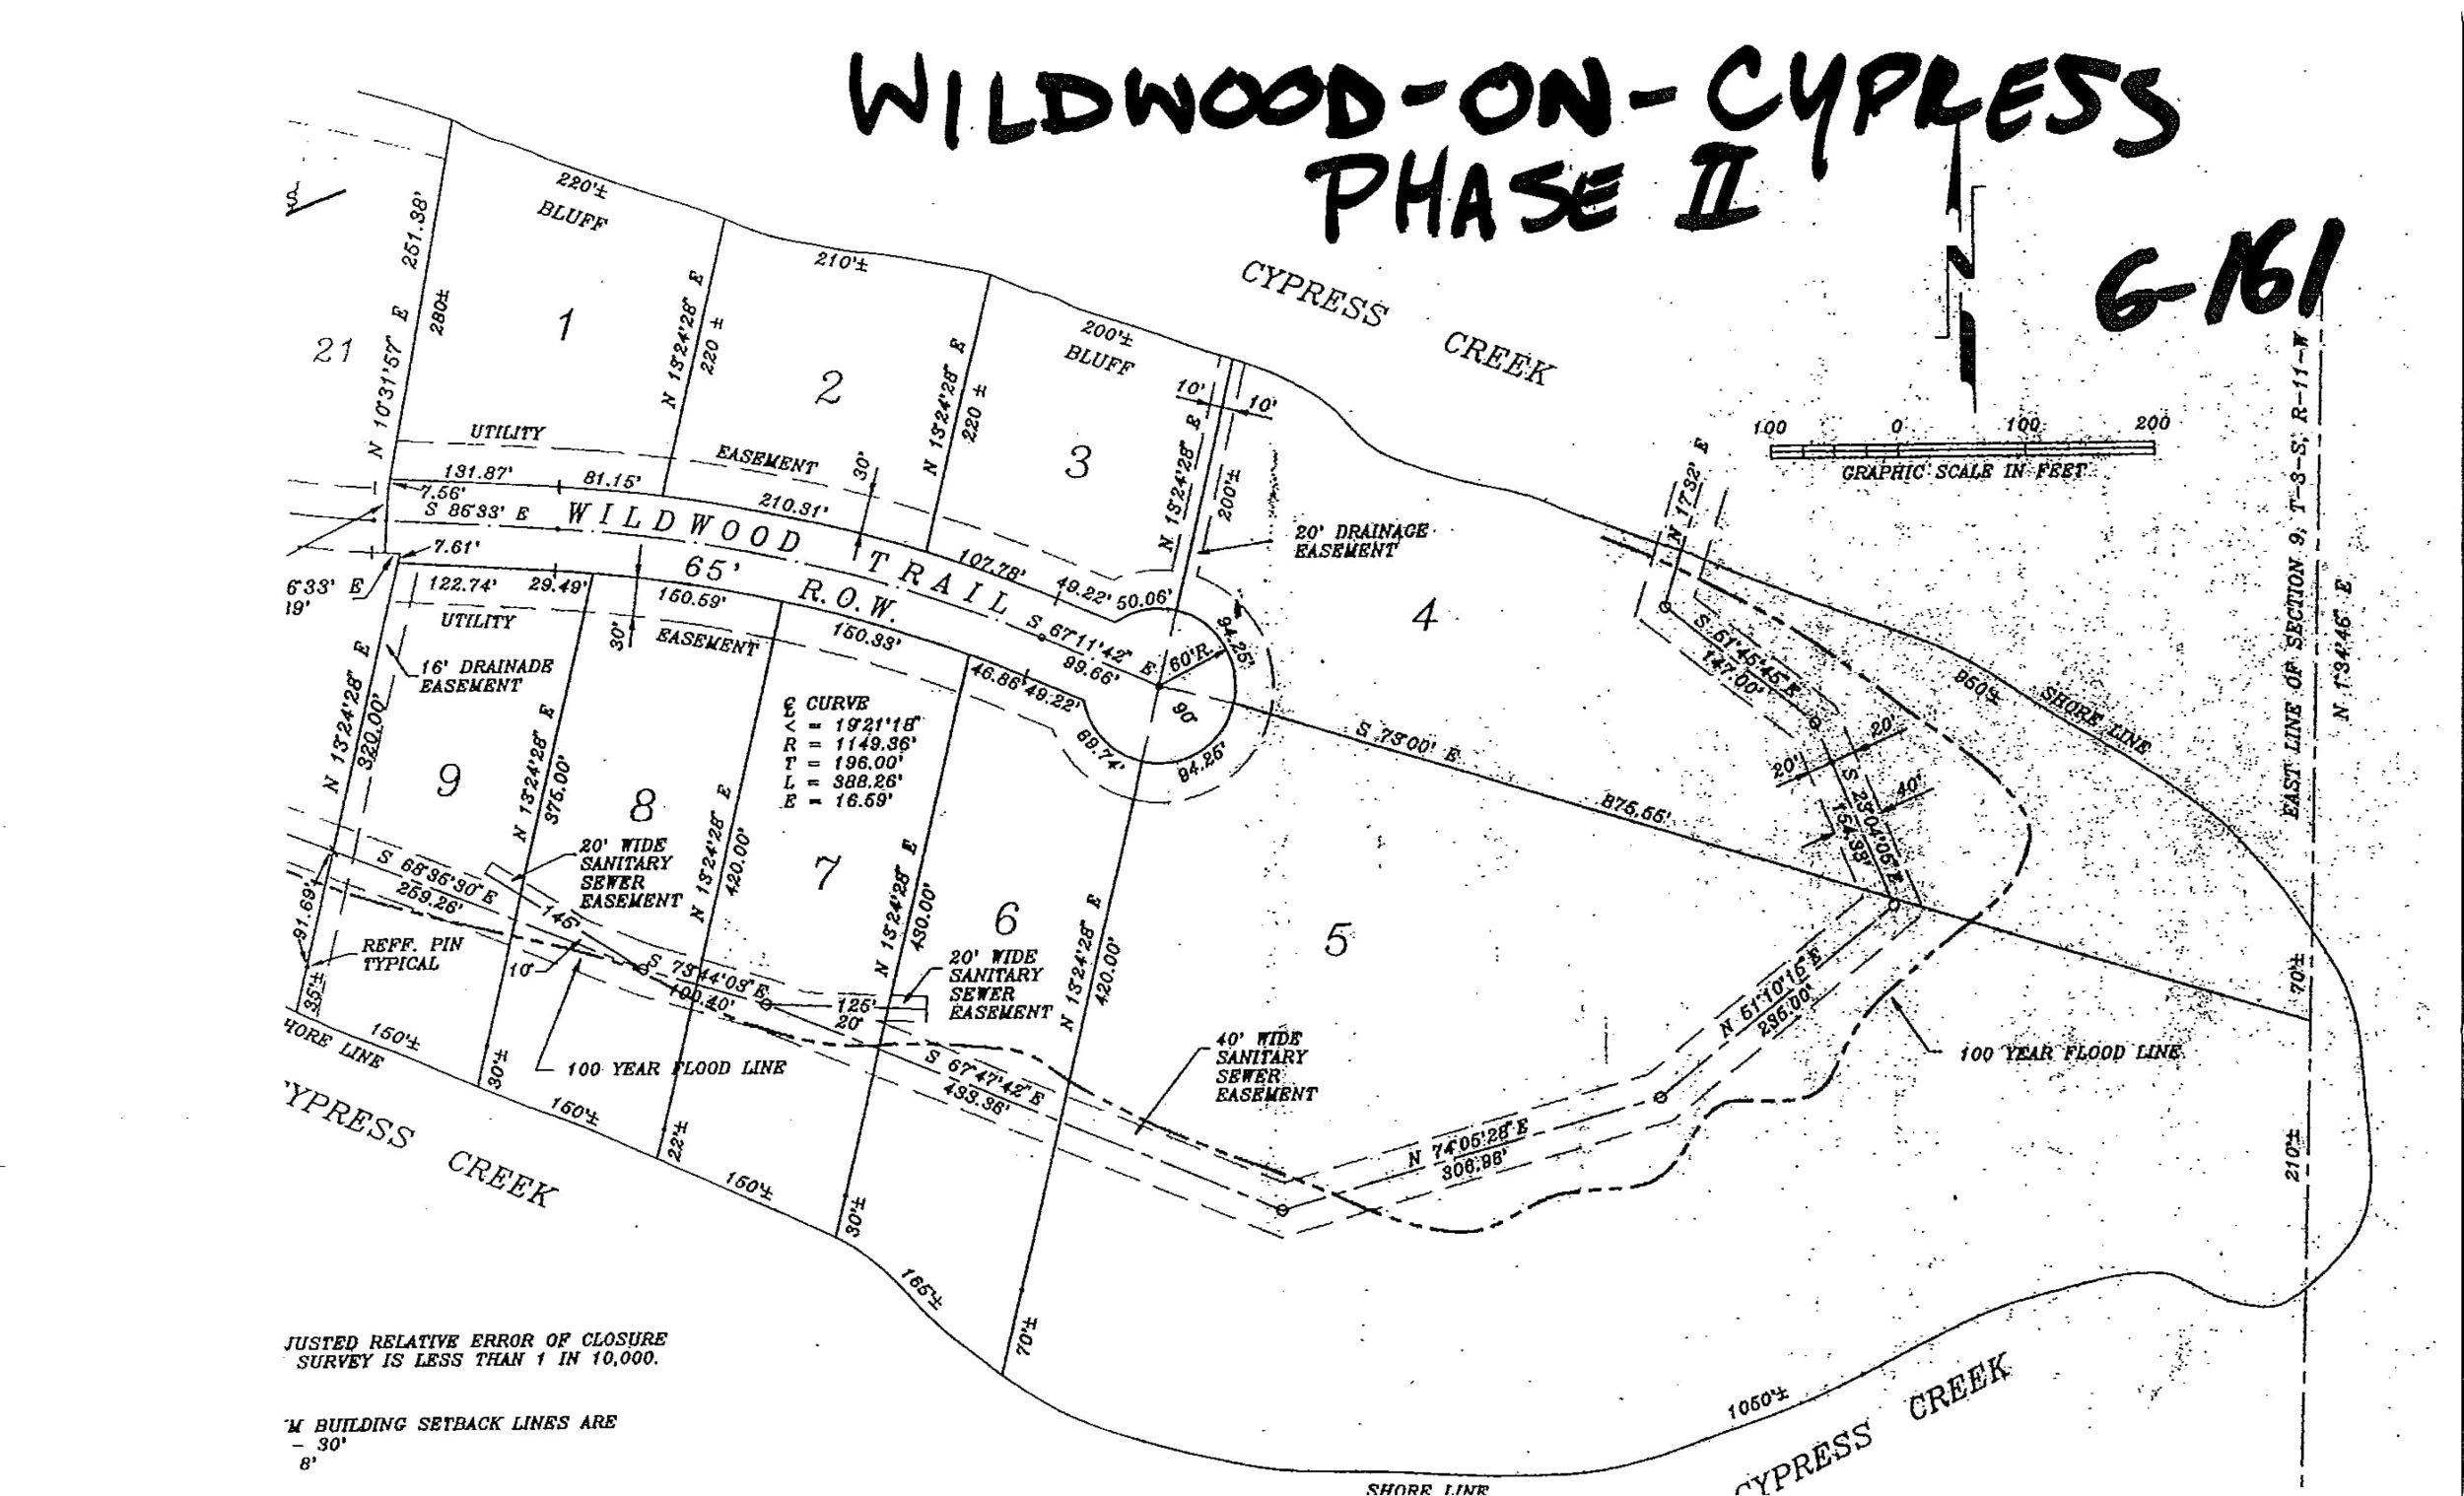 Plat-Wildwood-on-Cypress-Phase-II-1.jpg